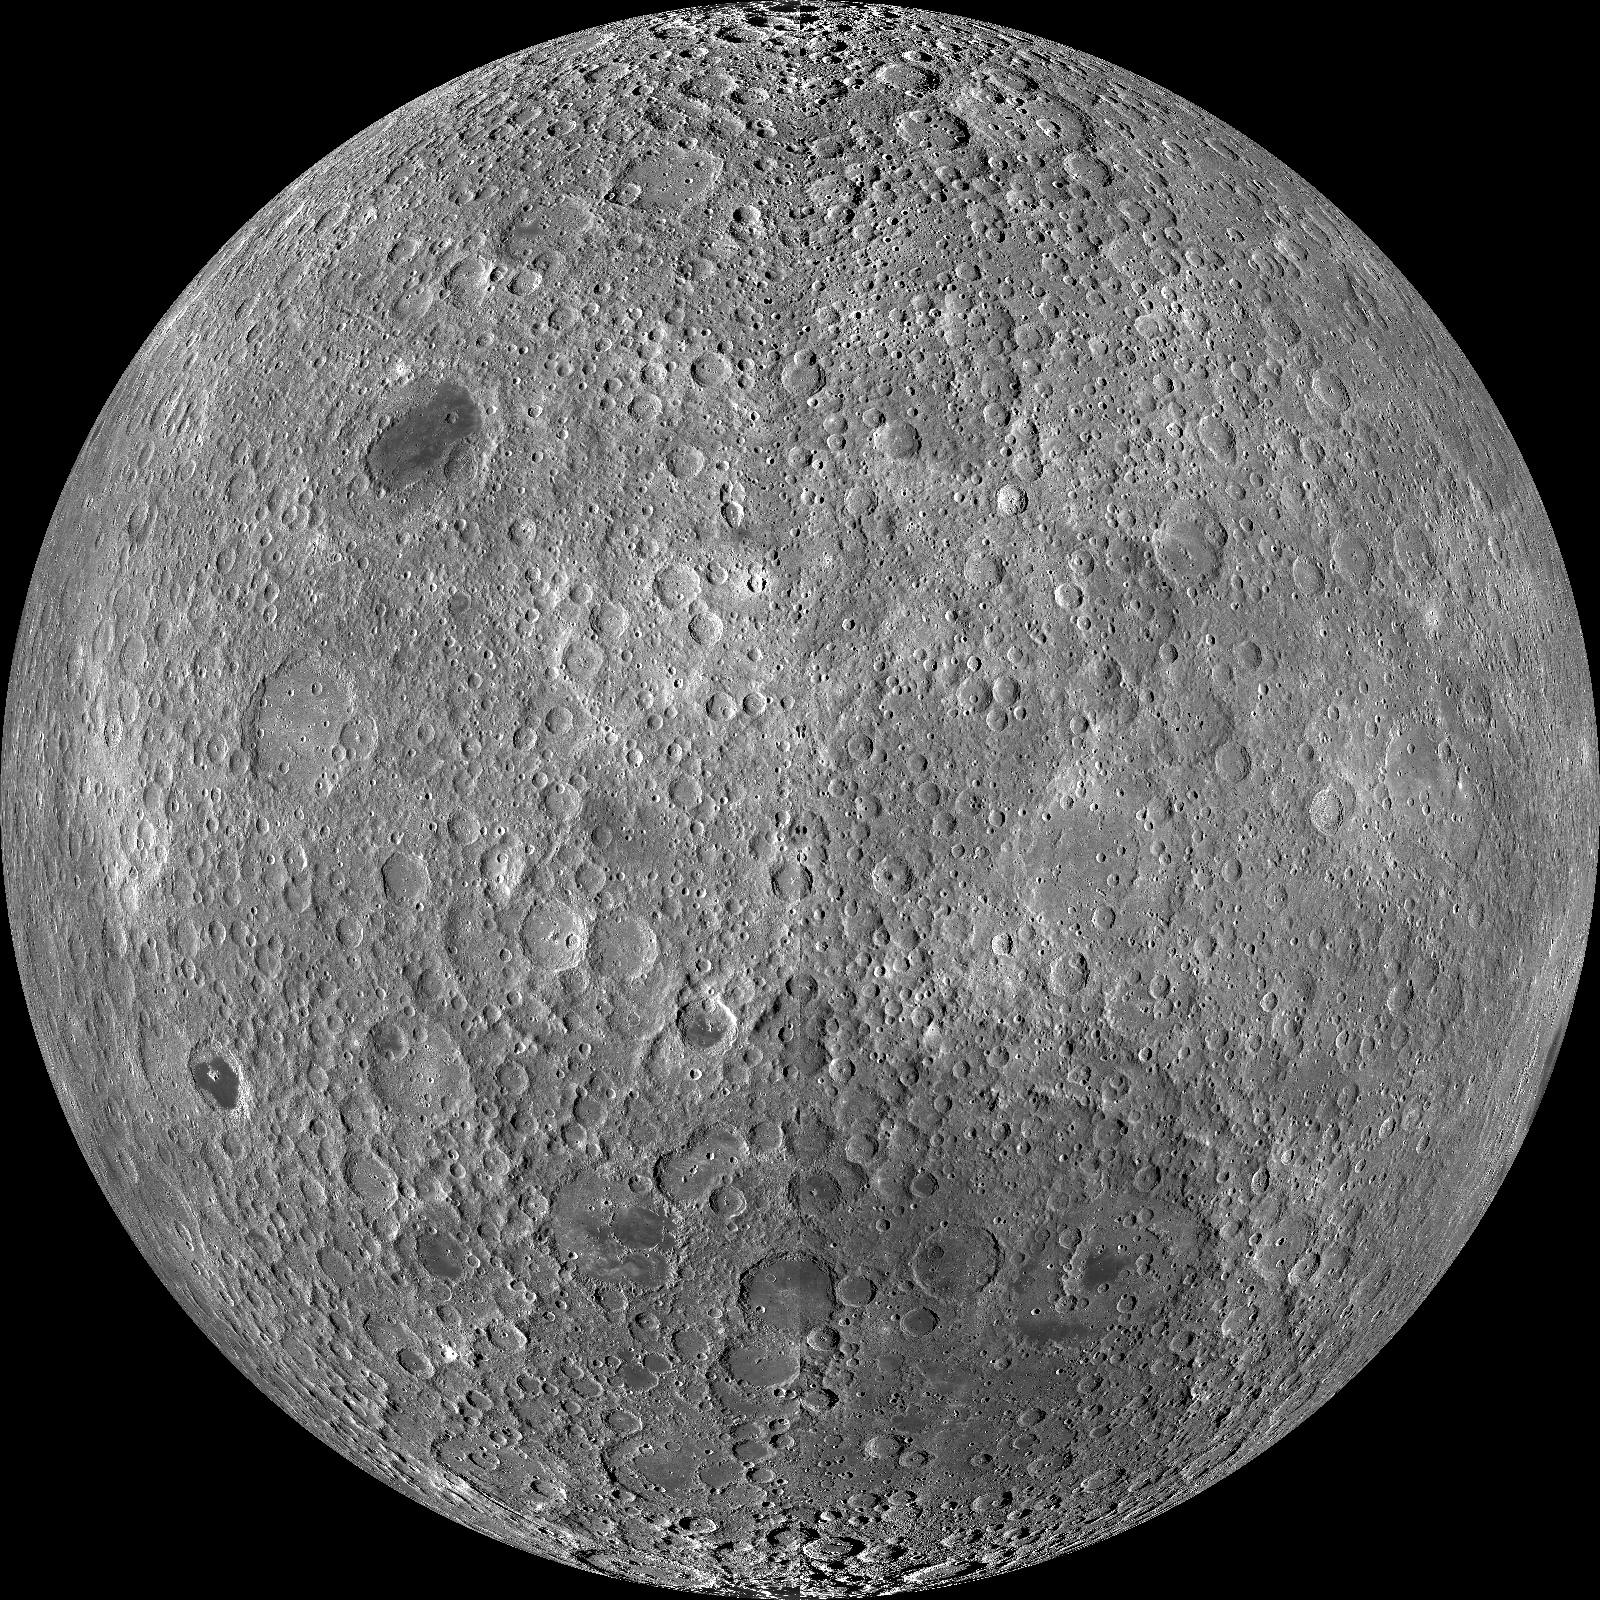 VCSE - A Hold túloldala - APOD